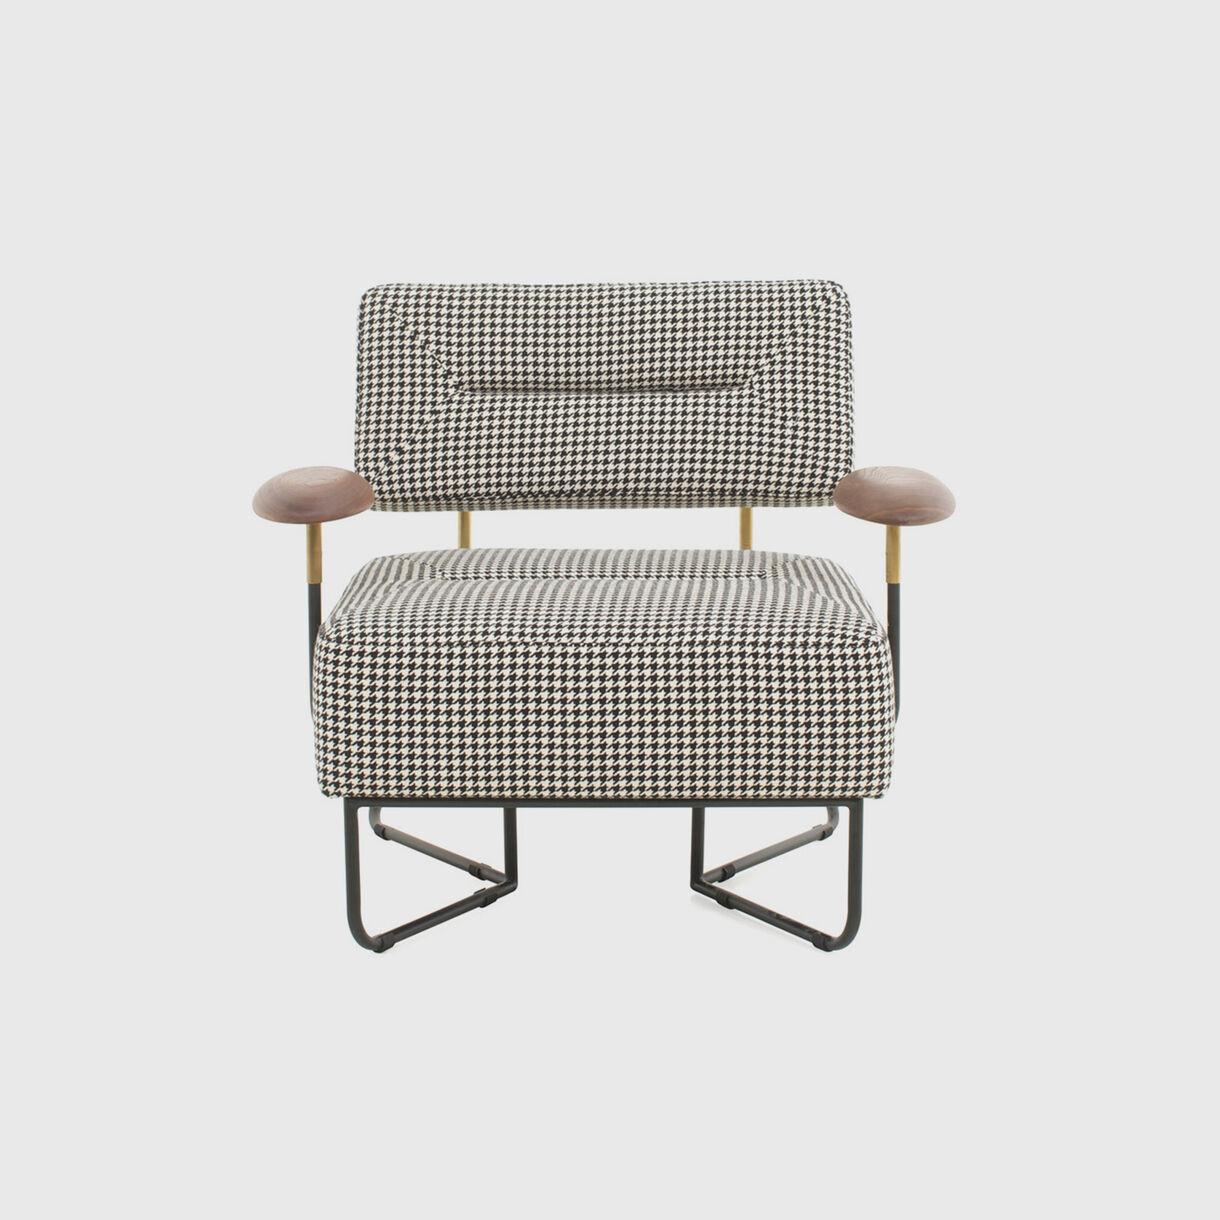 QT Chair